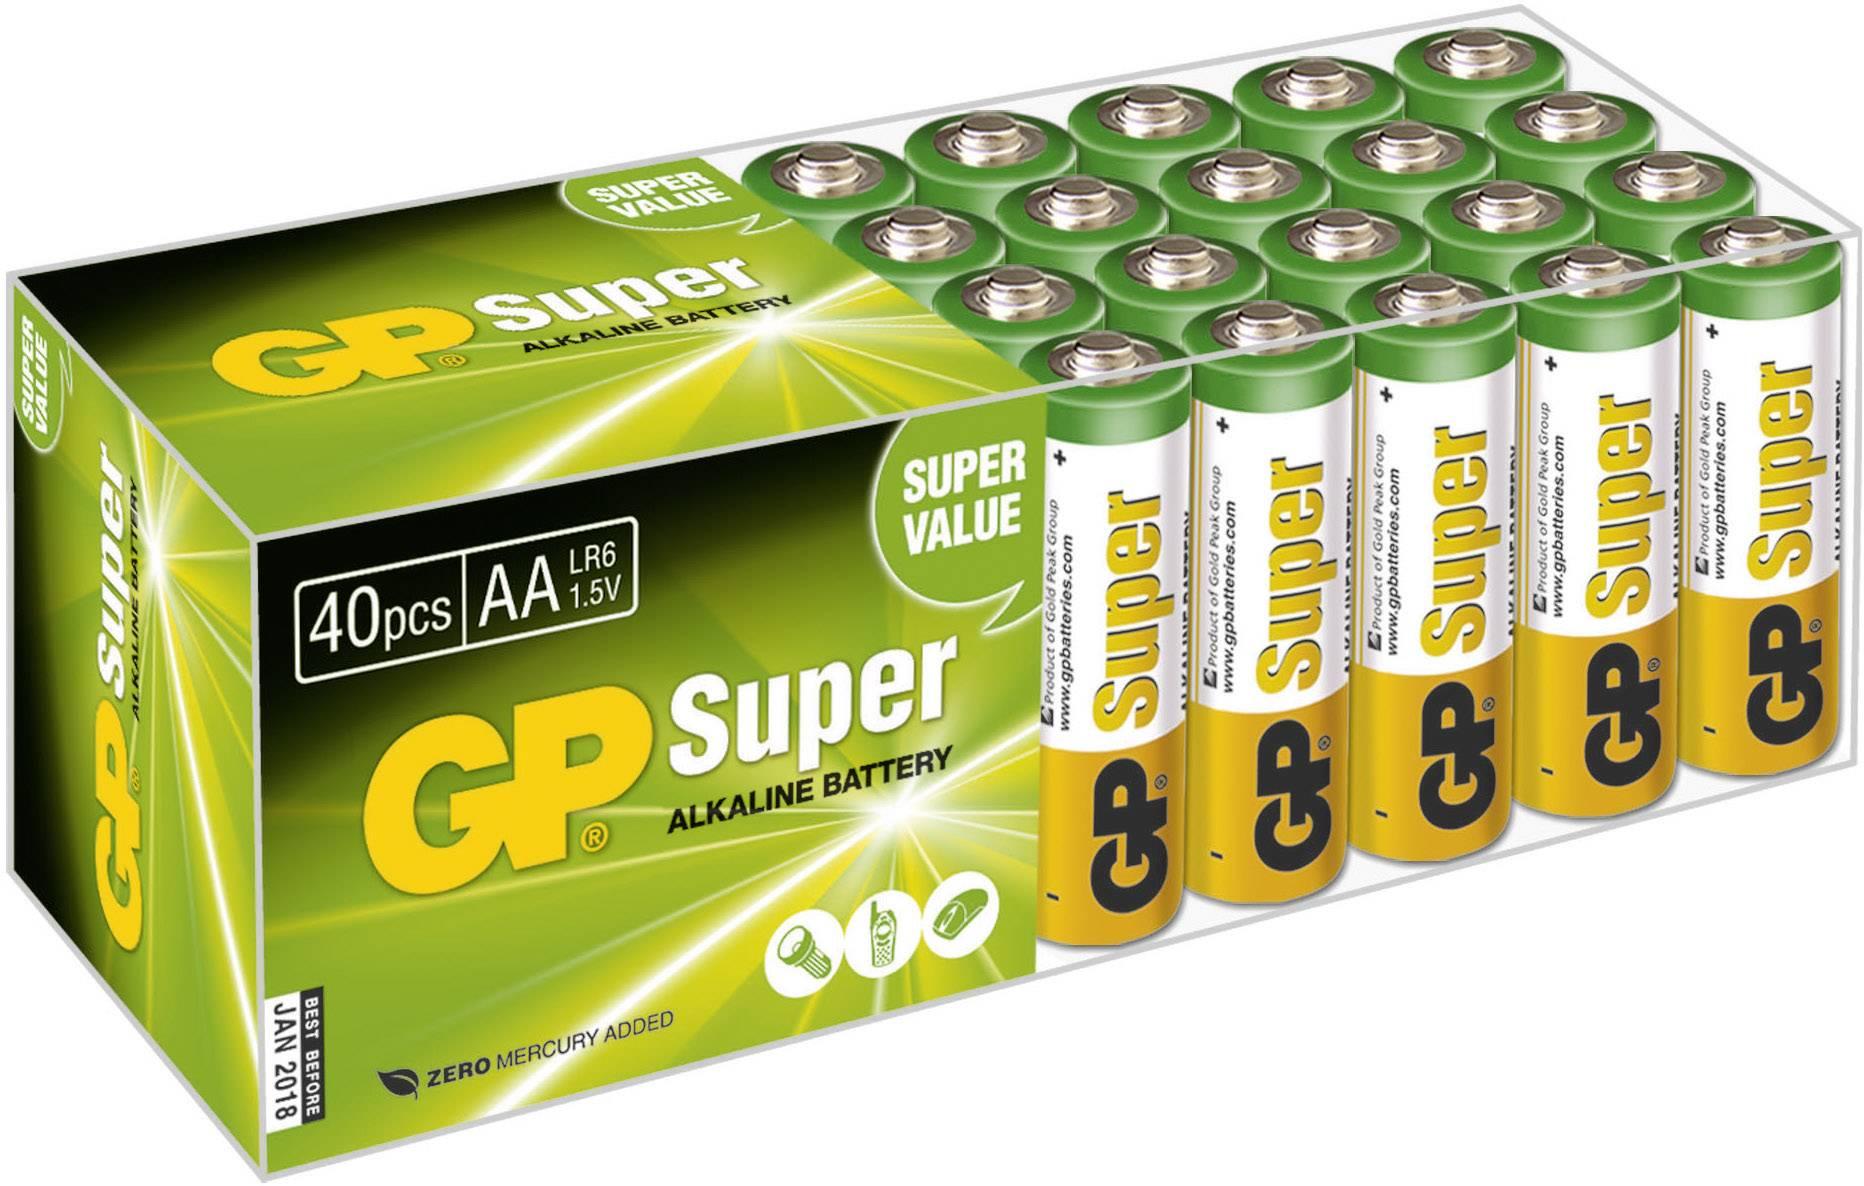 Tužková baterie AA alkalicko-manganová GP Batteries Super, 1.5 V, 40 ks